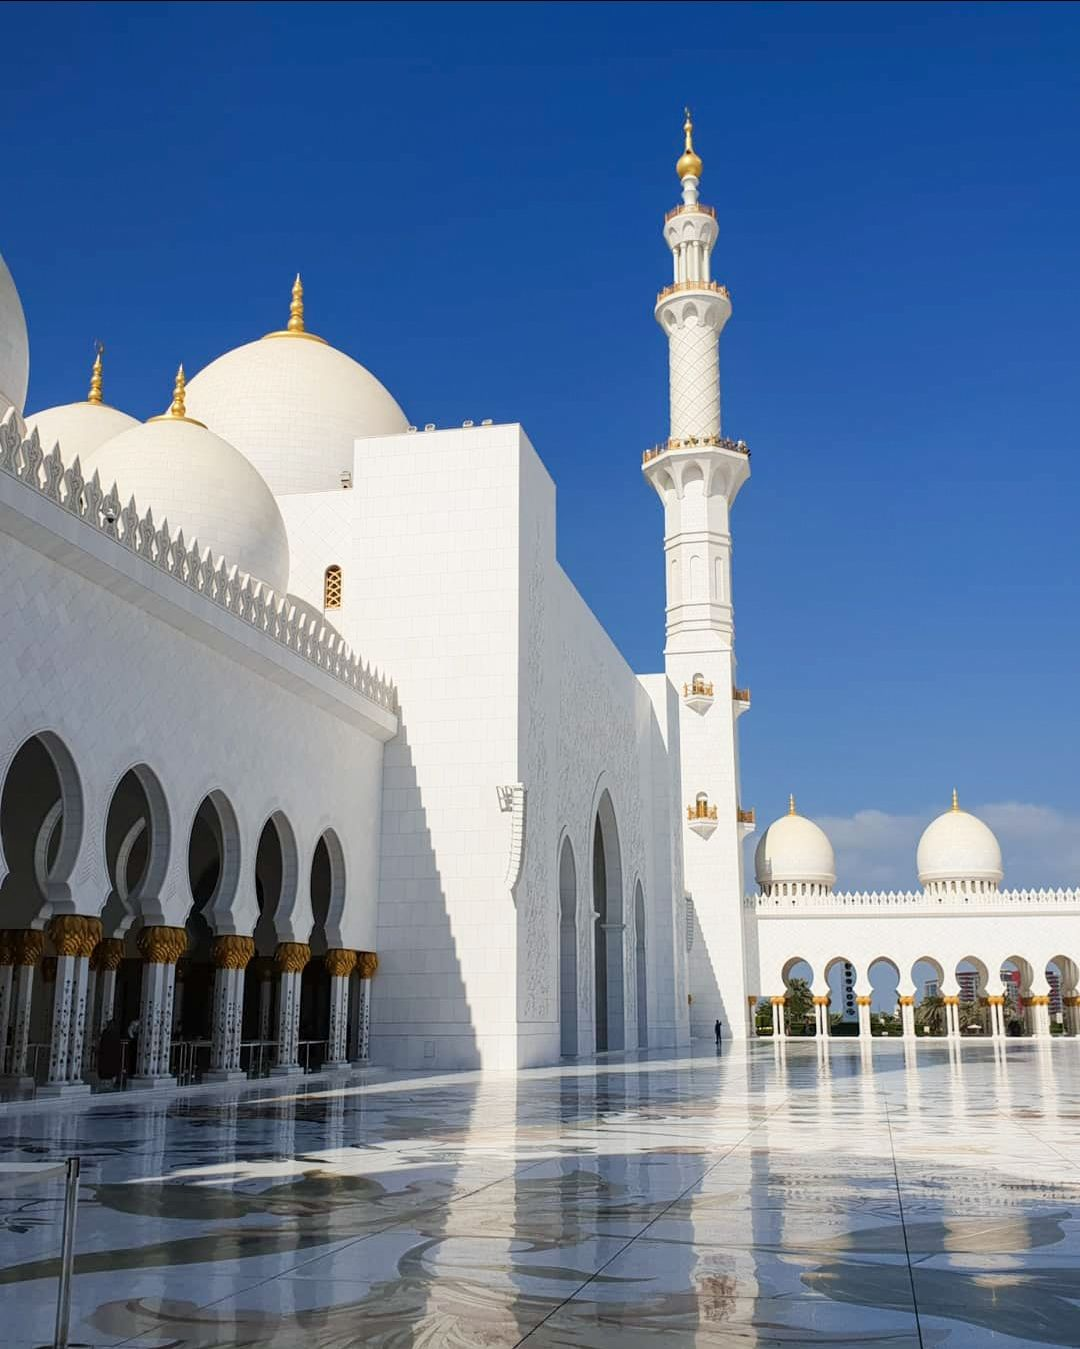 Photo of Sheikh Zayed Mosque - Abu Dhabi - United Arab Emirates By Sanjari Arora